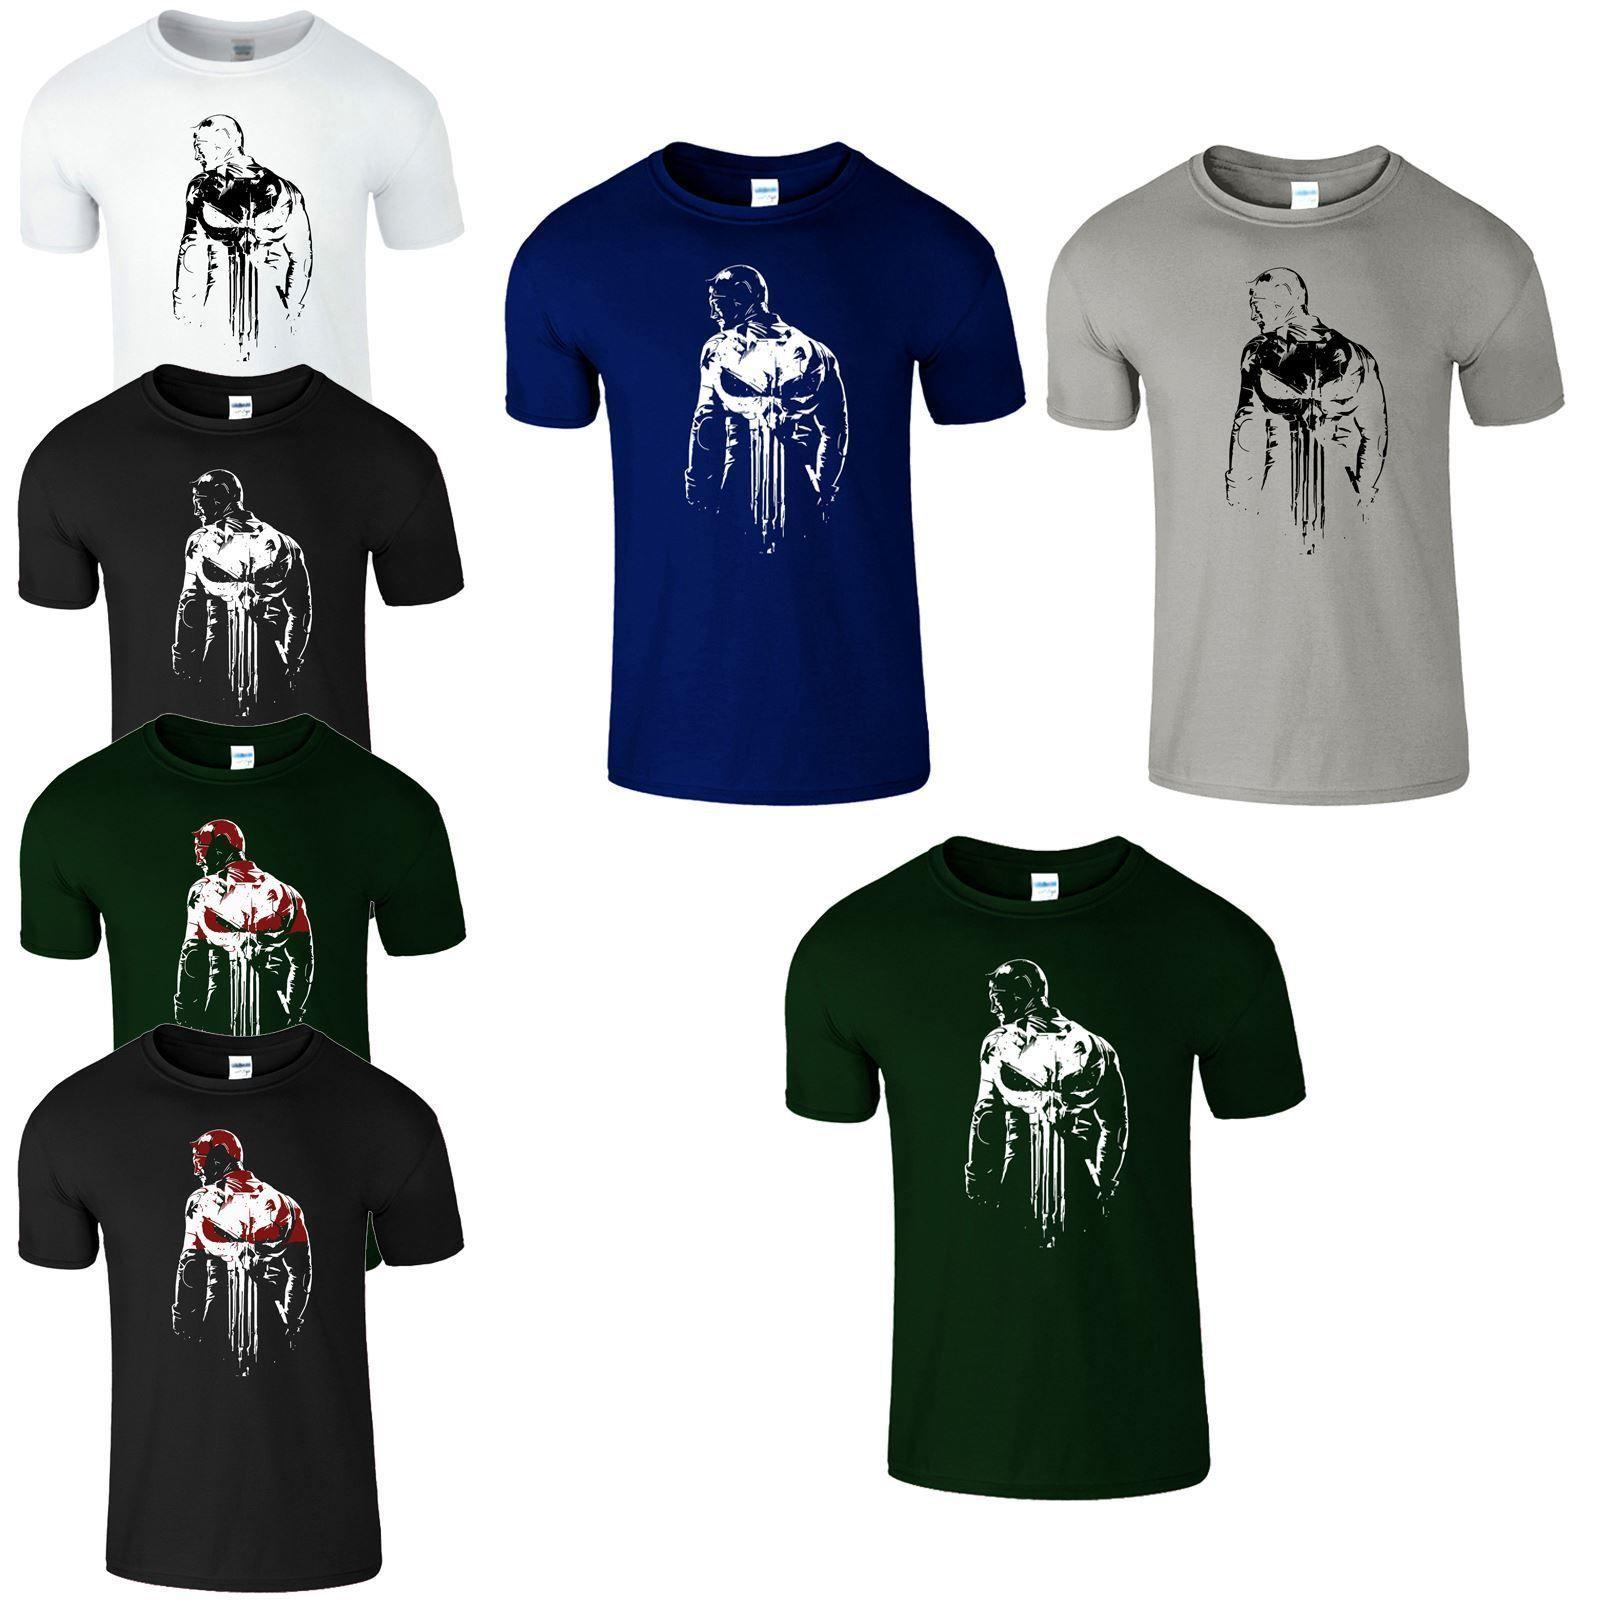 96e1f0352 Daredevil Punisher Mens T Shirt Marvel Bodybuilding Skull Gym Gamer Top TShirt  Cool Casual Pride T Shirt T Shirts Shop Online Of T Shirts From  Designtshirts ...